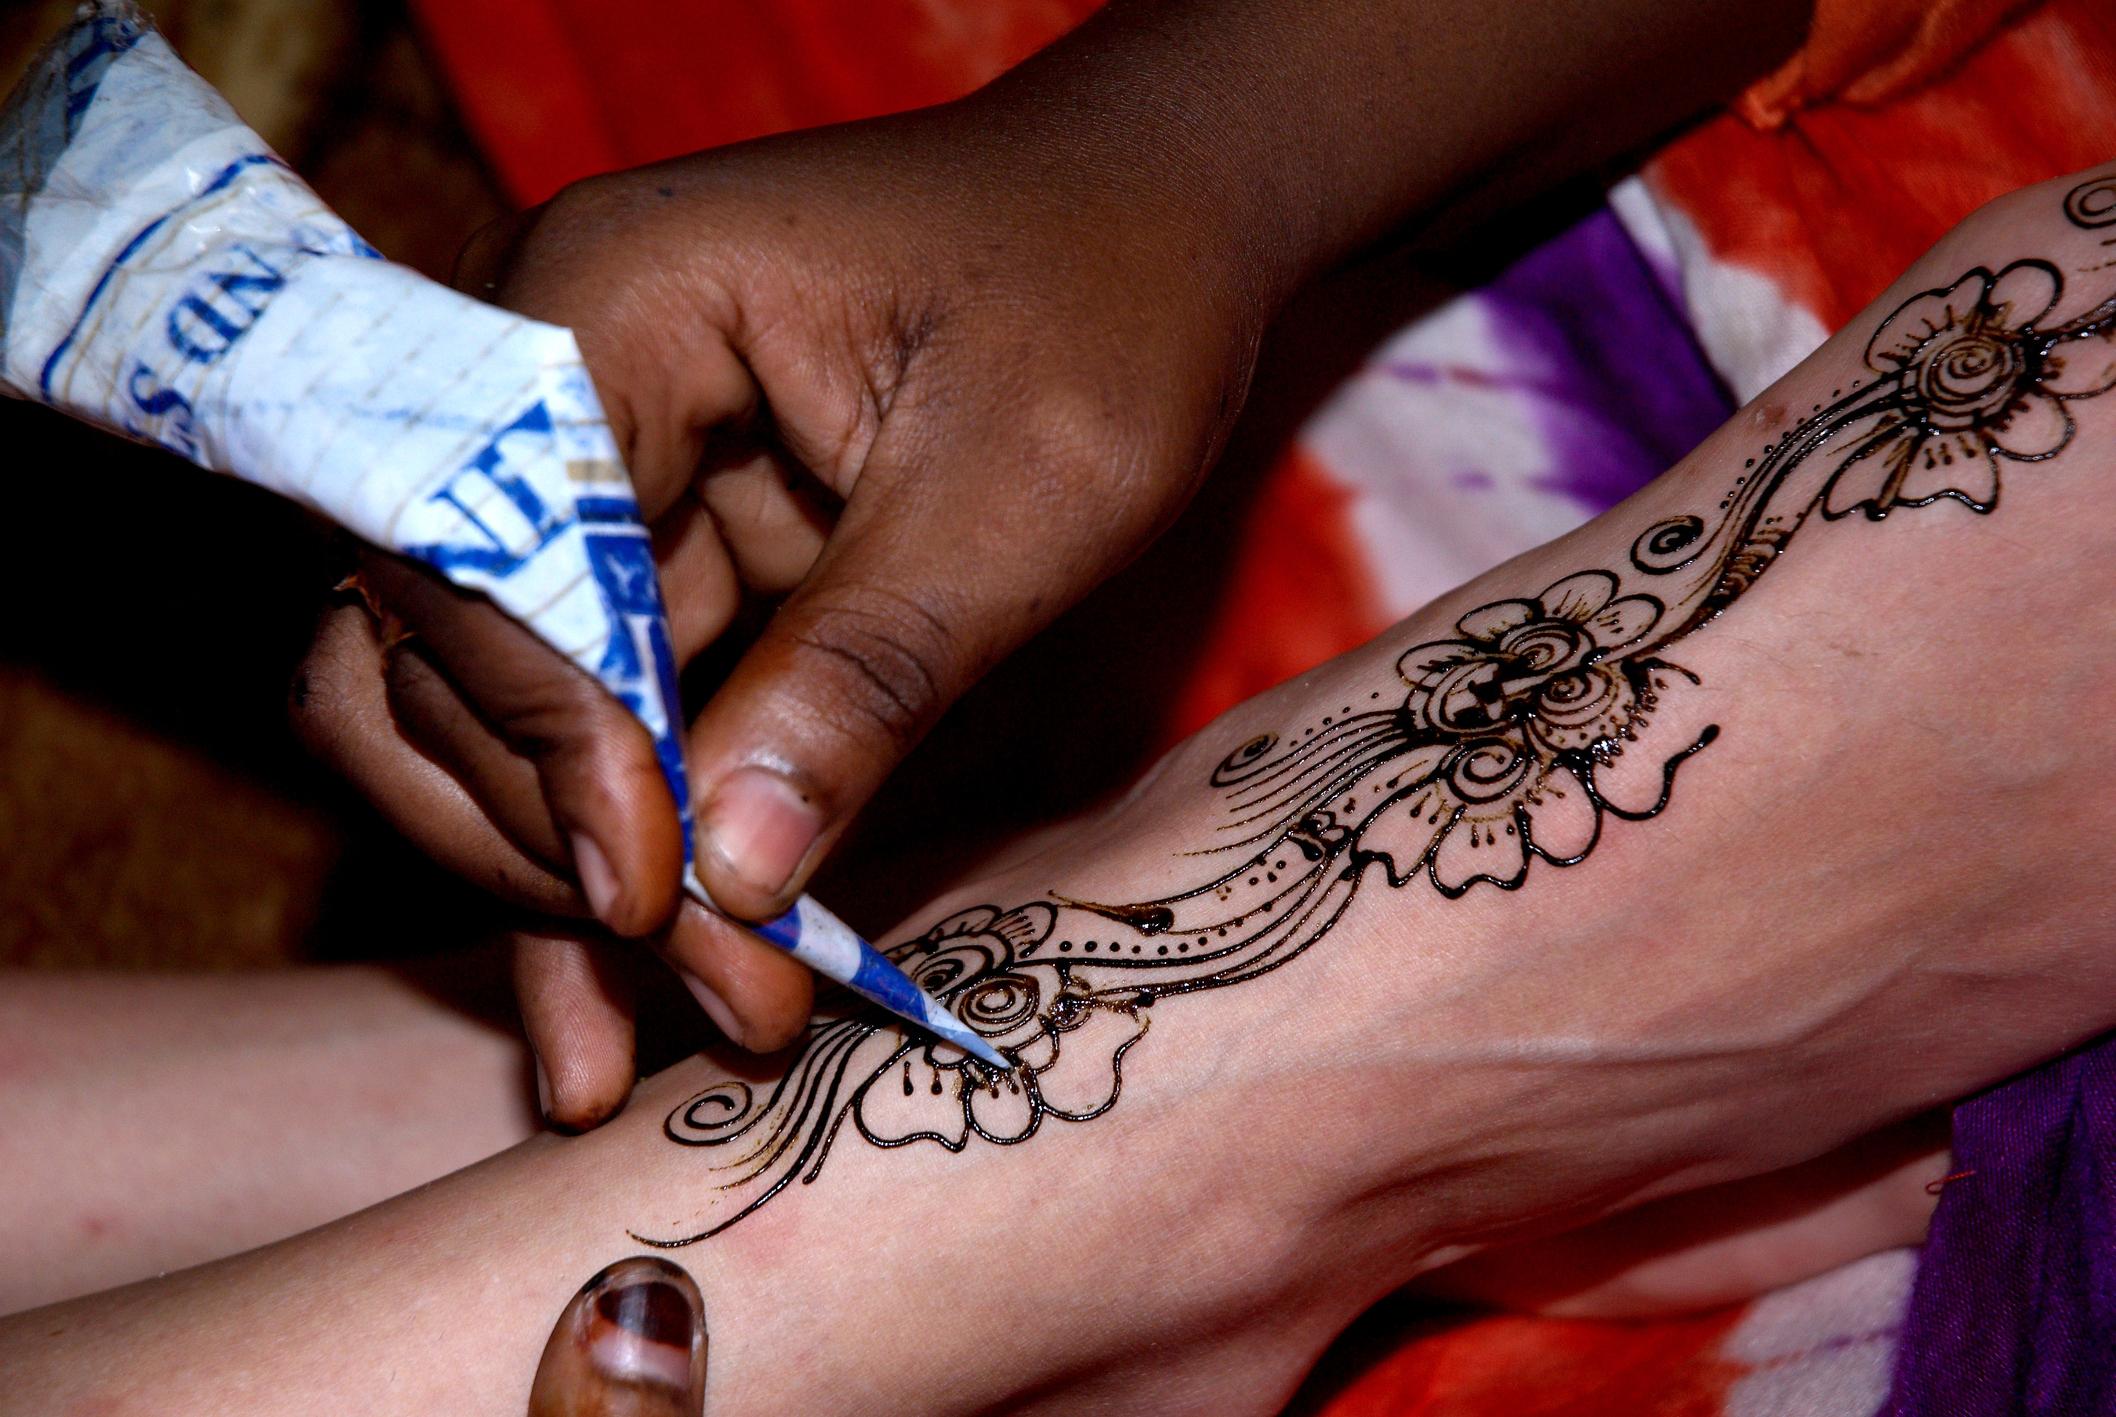 Henna Tattoo Vs Real Tattoo: Estudio Revela Los Riesgos A La Salud Que Pueden Provocar